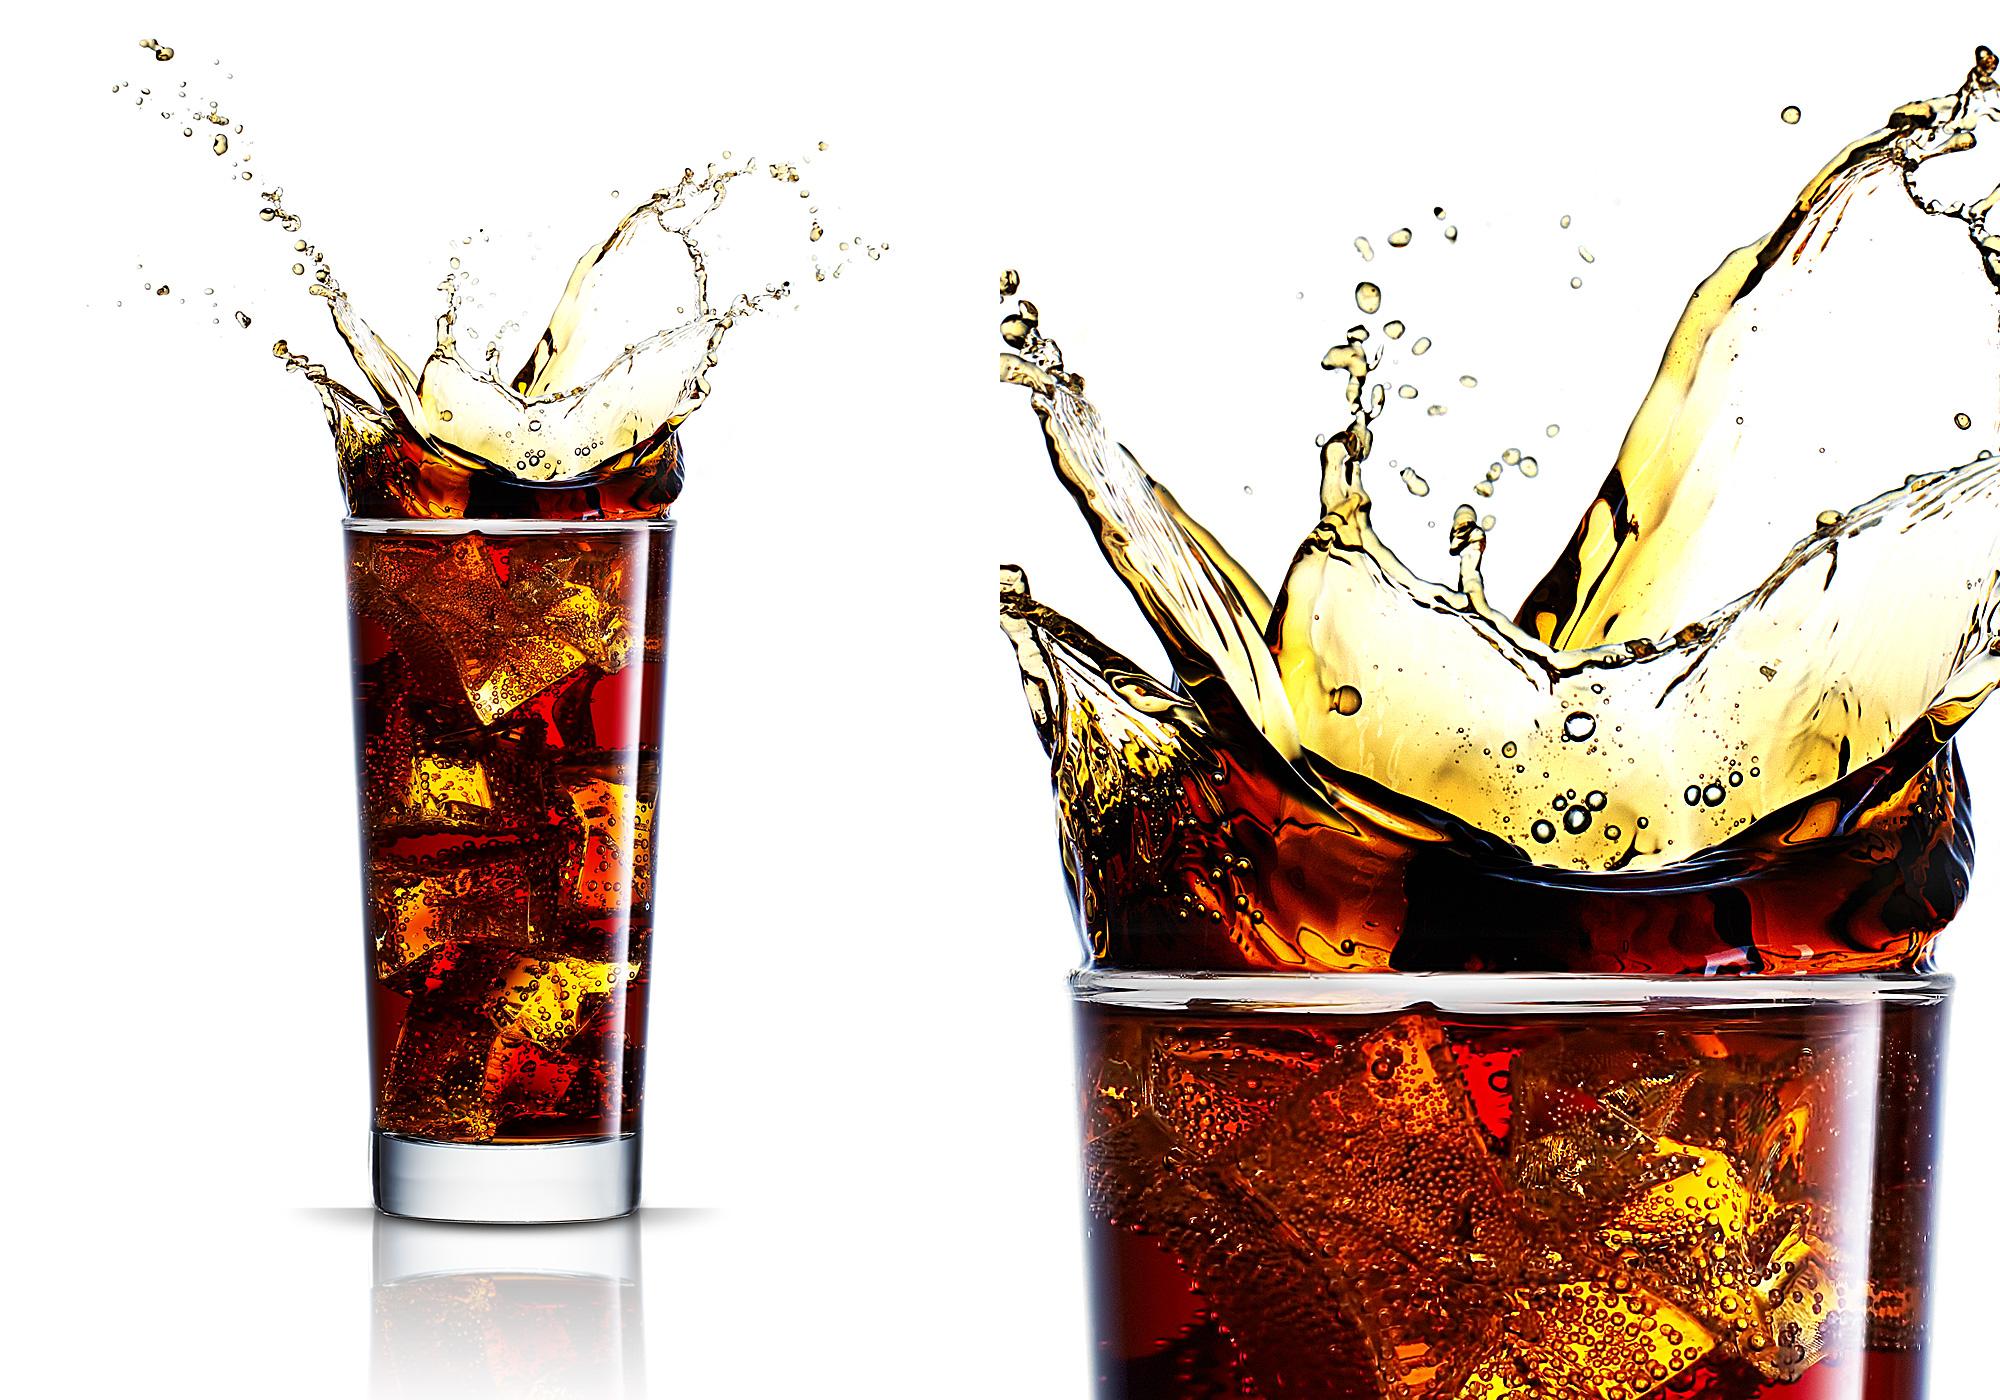 CocaColaSplash.jpg